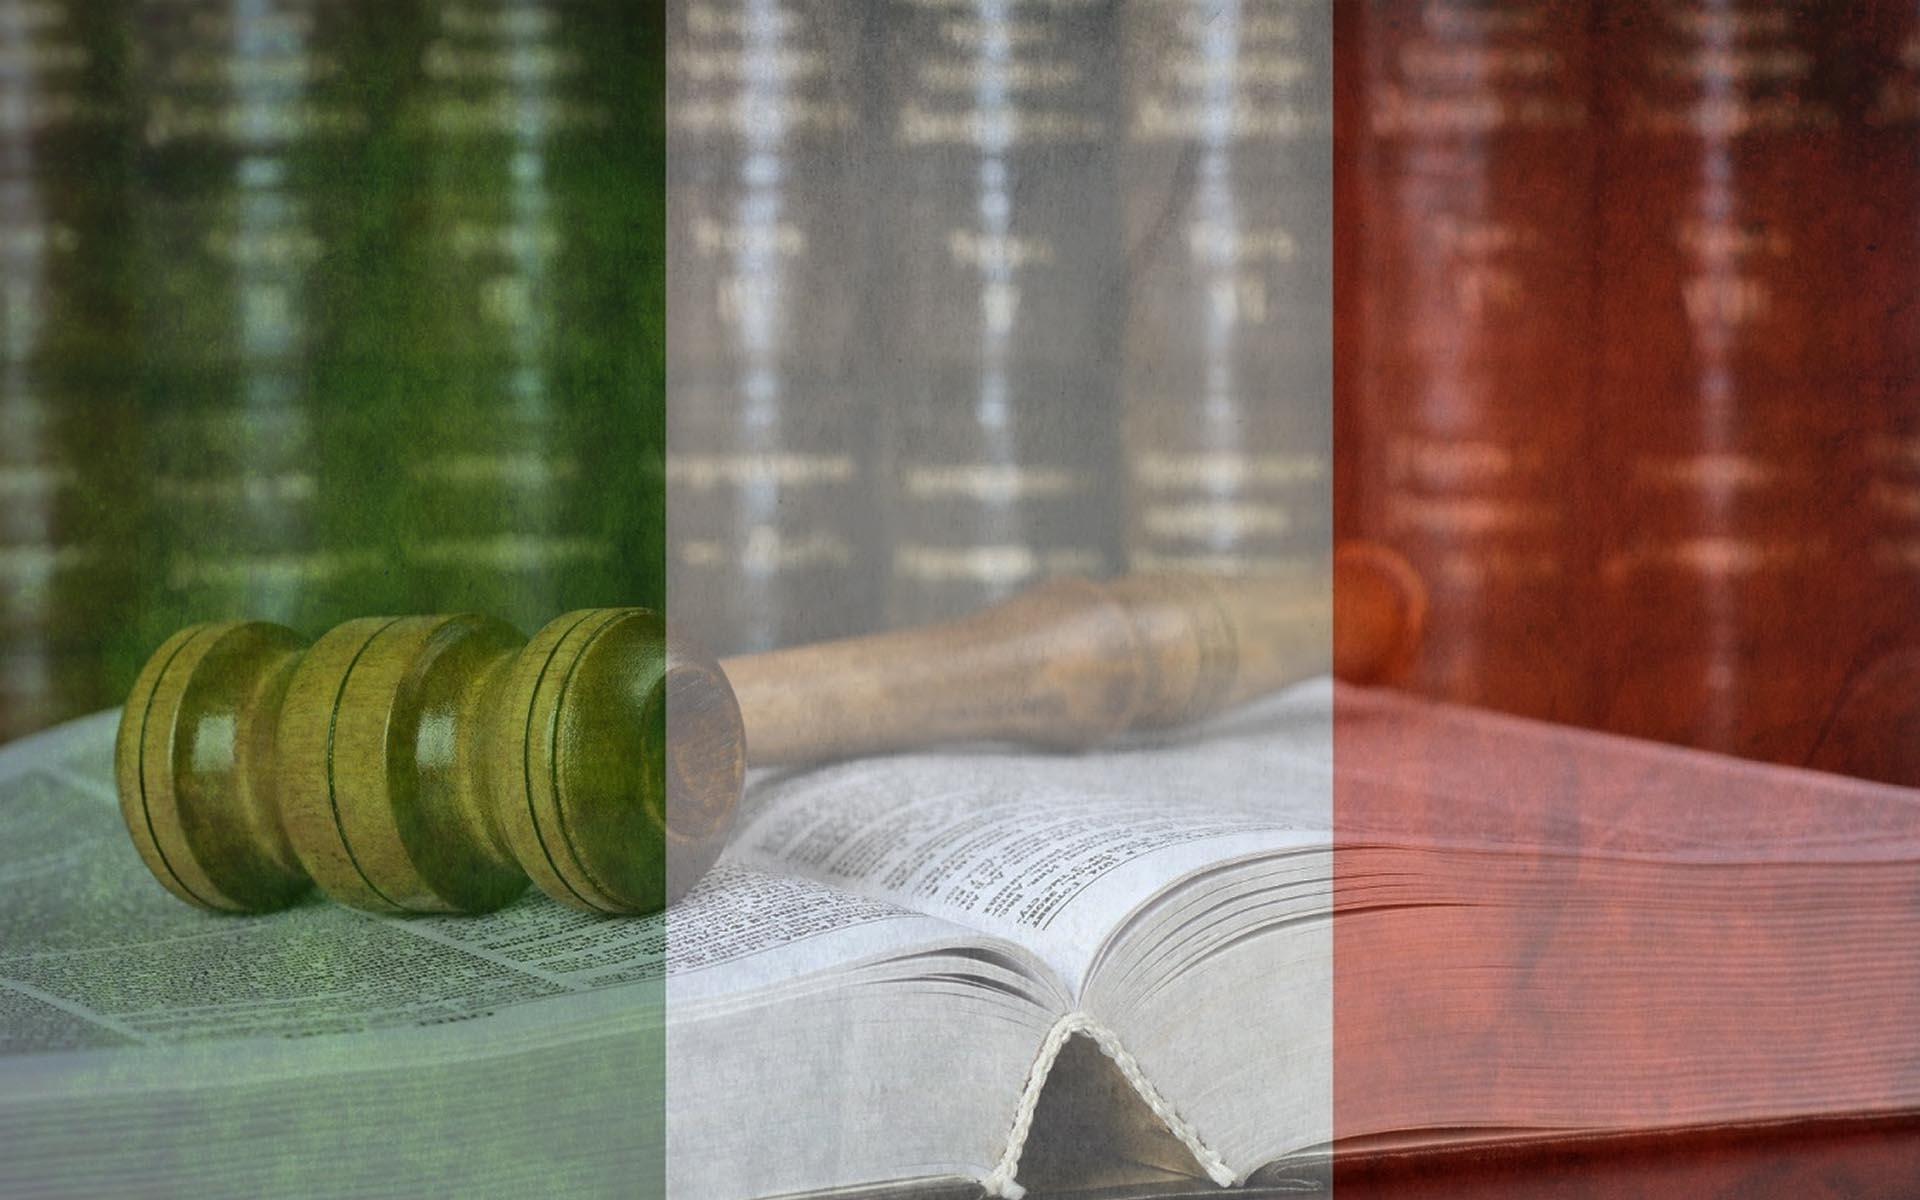 Italy Takes Labels OneCoin a Ponzi Scheme, Levies €2.5 Million Fine